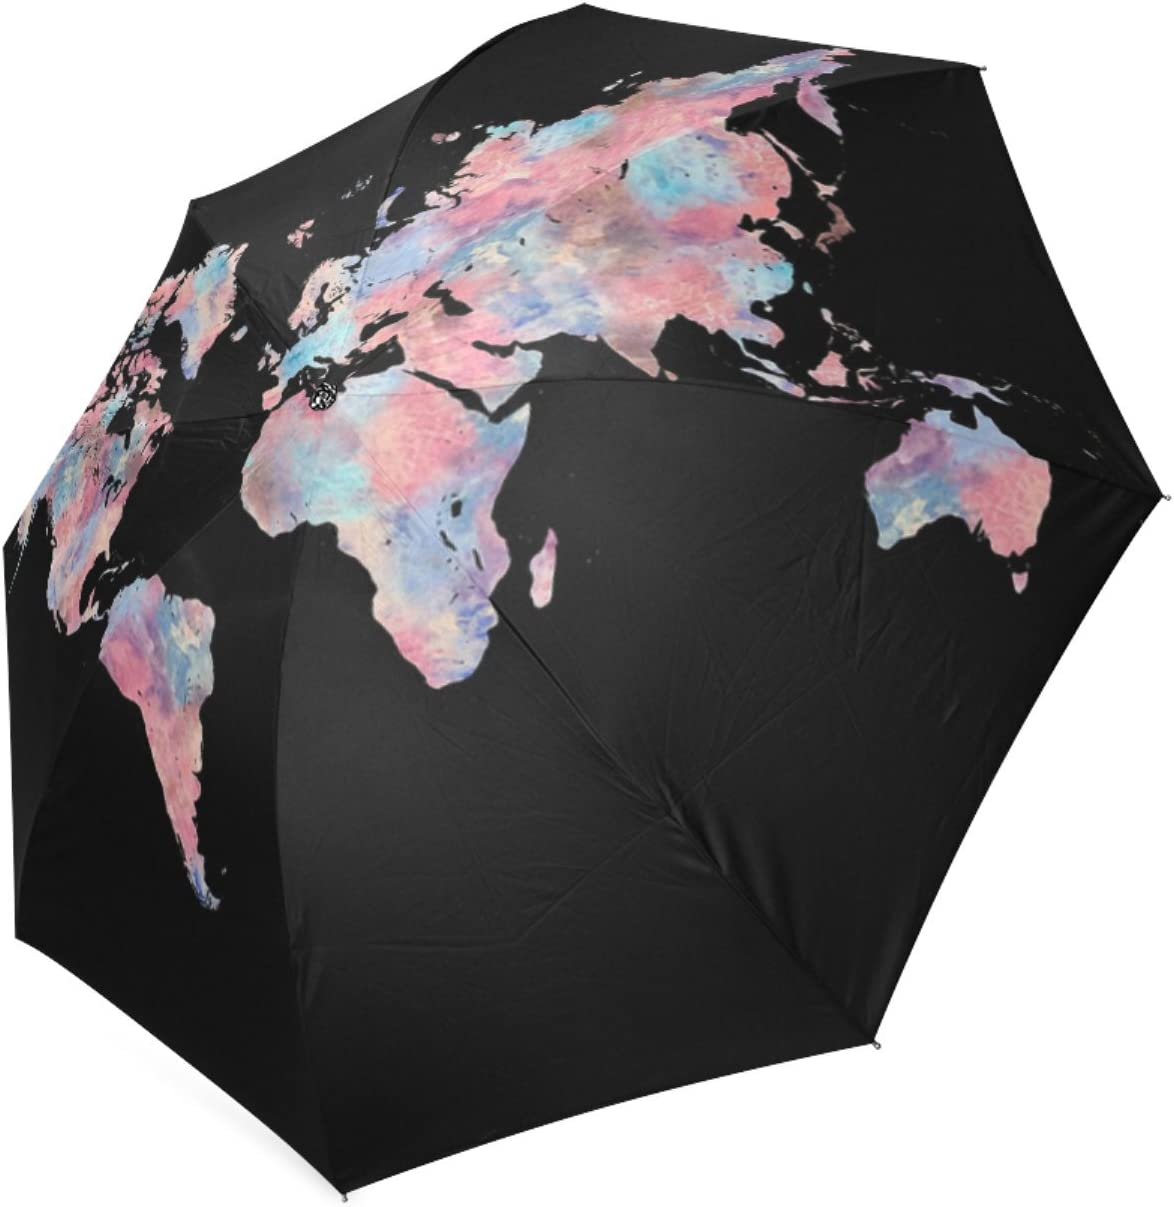 Personalized Wanderlust Foldable Umbrella Rain Compact Travel Umbrella